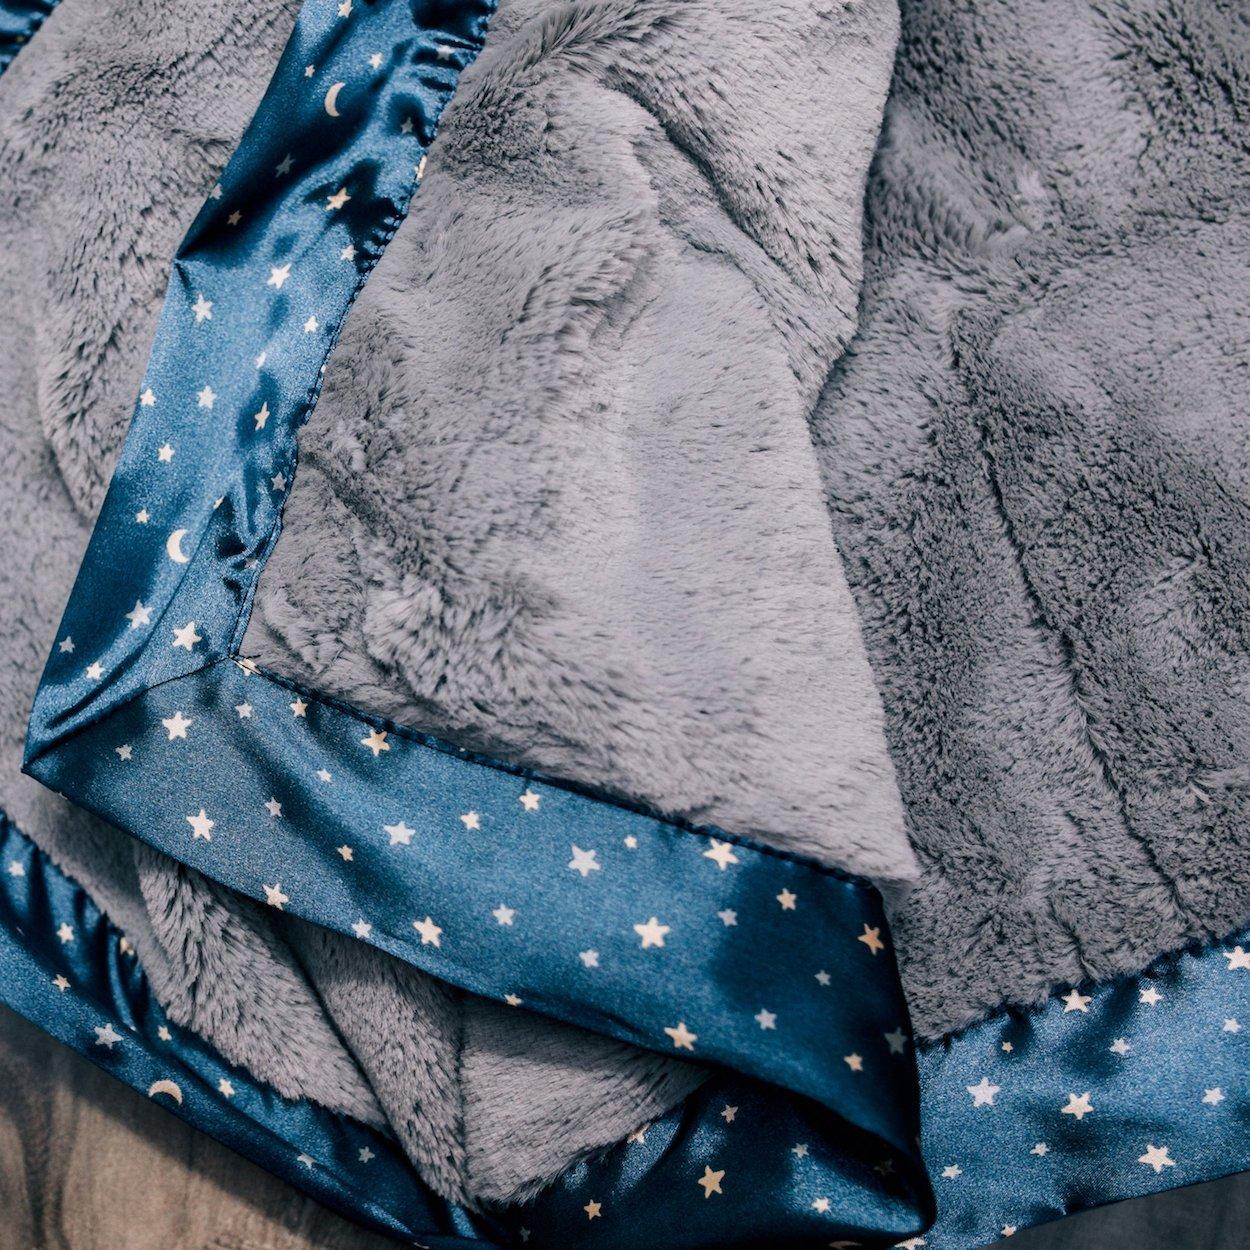 Saranoni Satin Border Receiving Blankets for Babies Super Soft Lush Luxury Baby Blanket (Gray Lush Navy Twinkle Star Satin Border, Receiving Blanket 30'' x 40'')